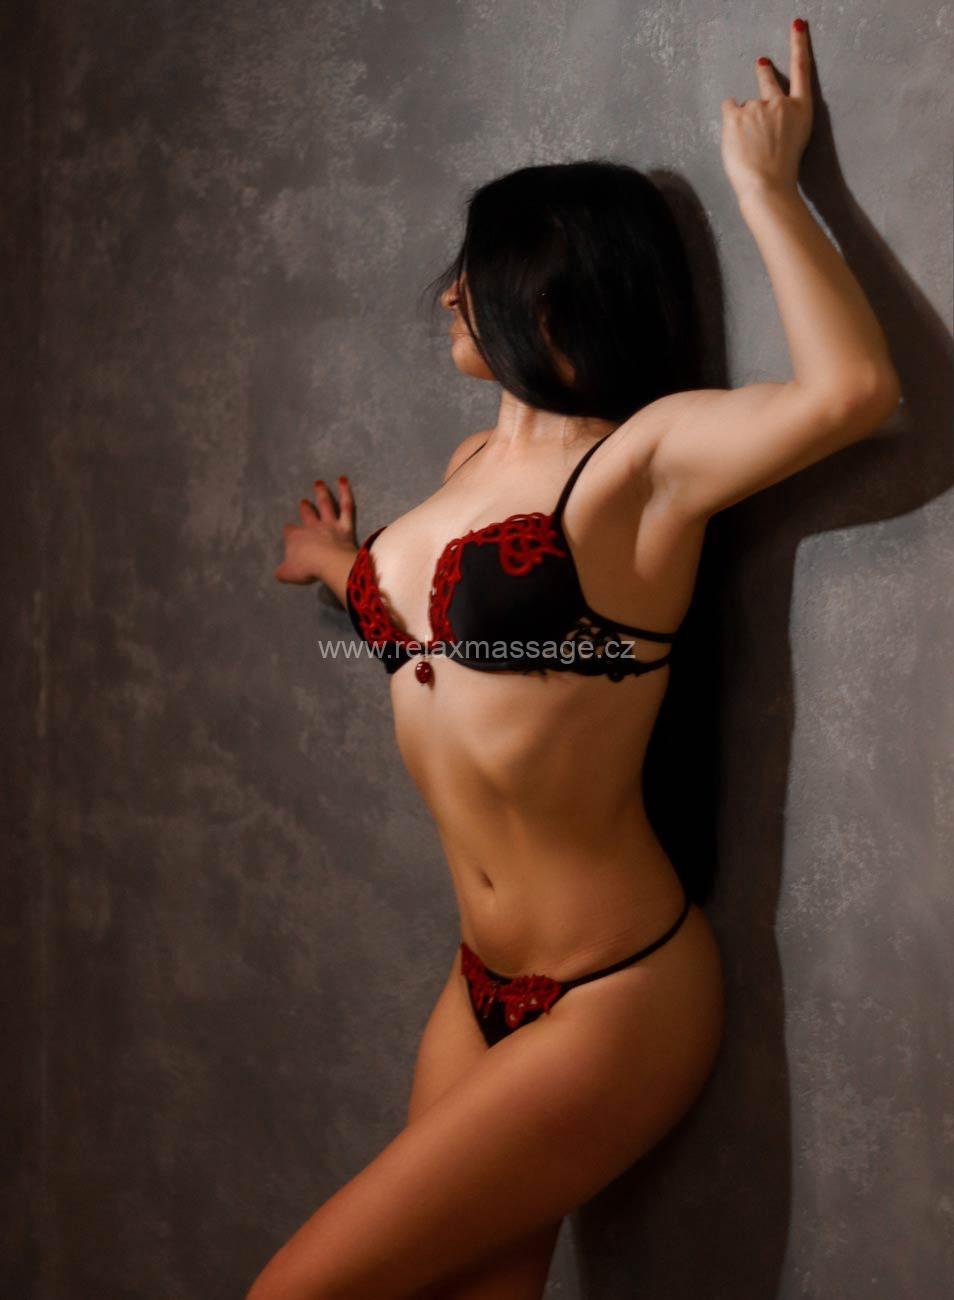 Sofy the best erotic massage in Prague